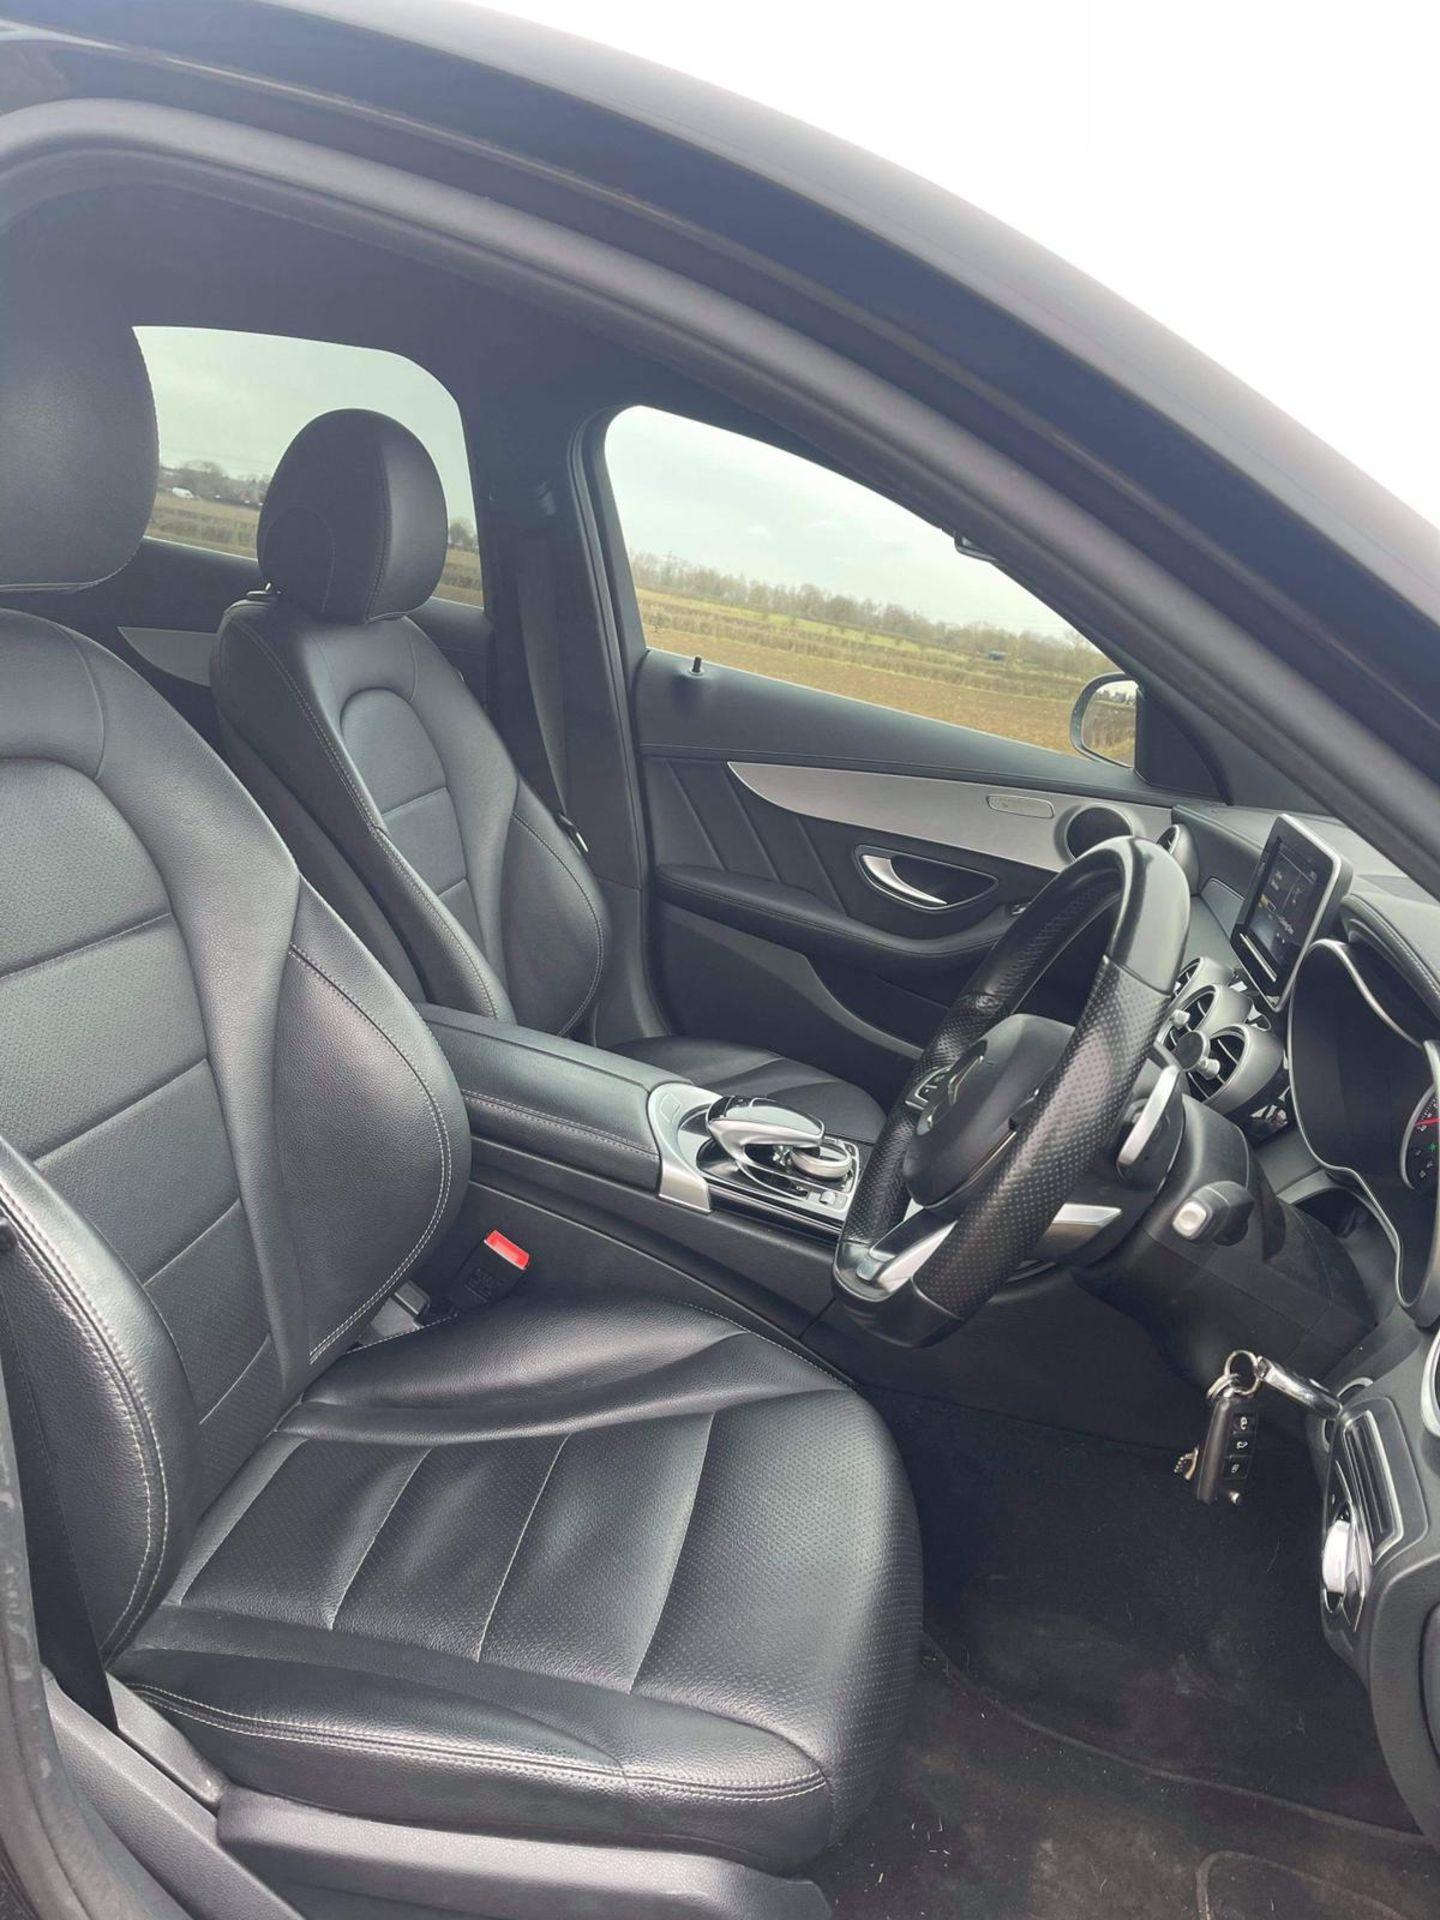 2015 MERCEDES-BENZ C300 AMG LINE BLUETEC HYBRID A, BLACK, AUTOMATIC, ELECTRIC DIESEL, NO VAT - Image 11 of 13